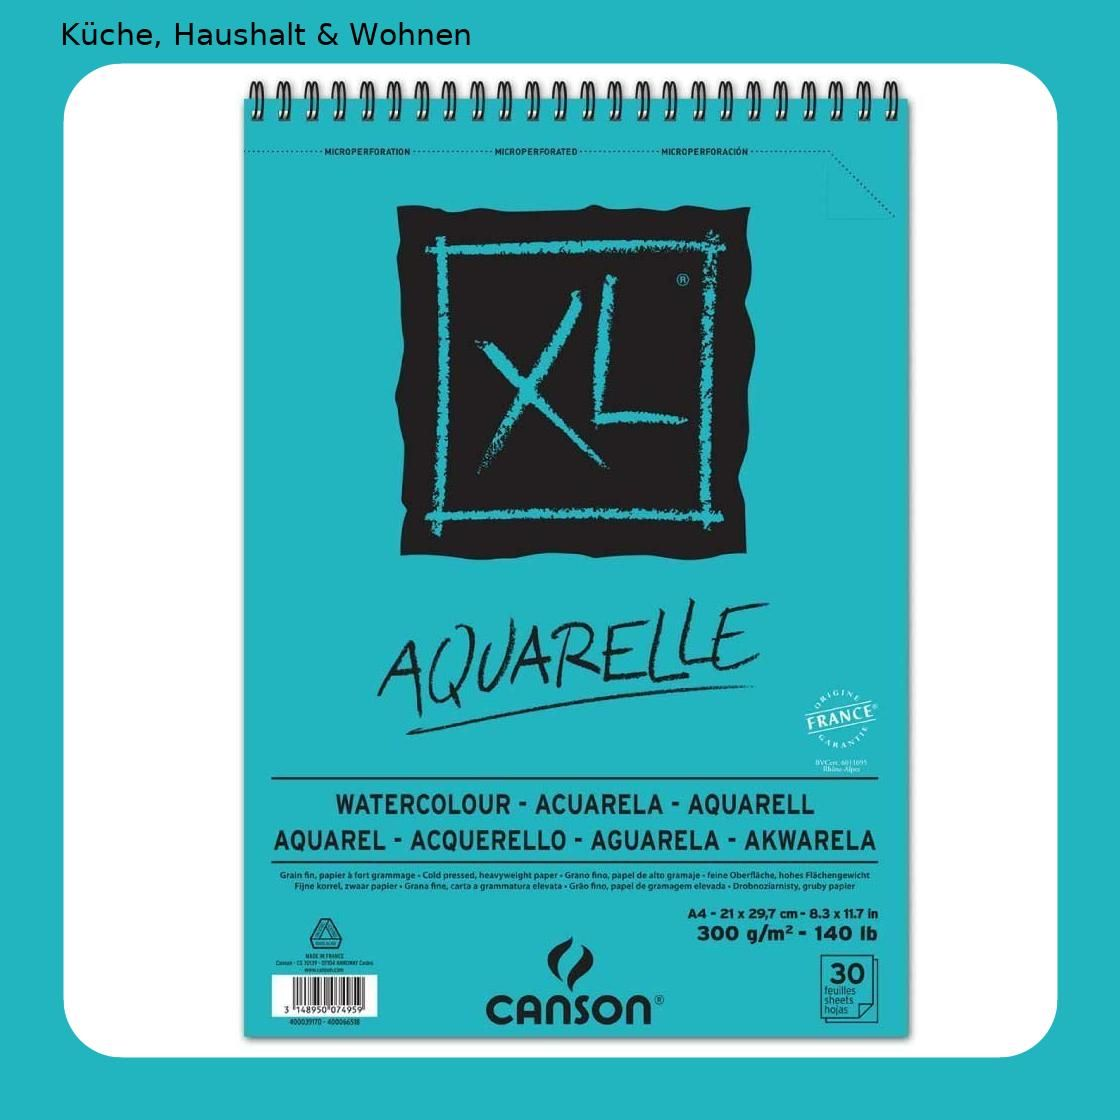 Canson 400039170 Skizzen Und Studienblock Xl Aquarelle Din A4 In